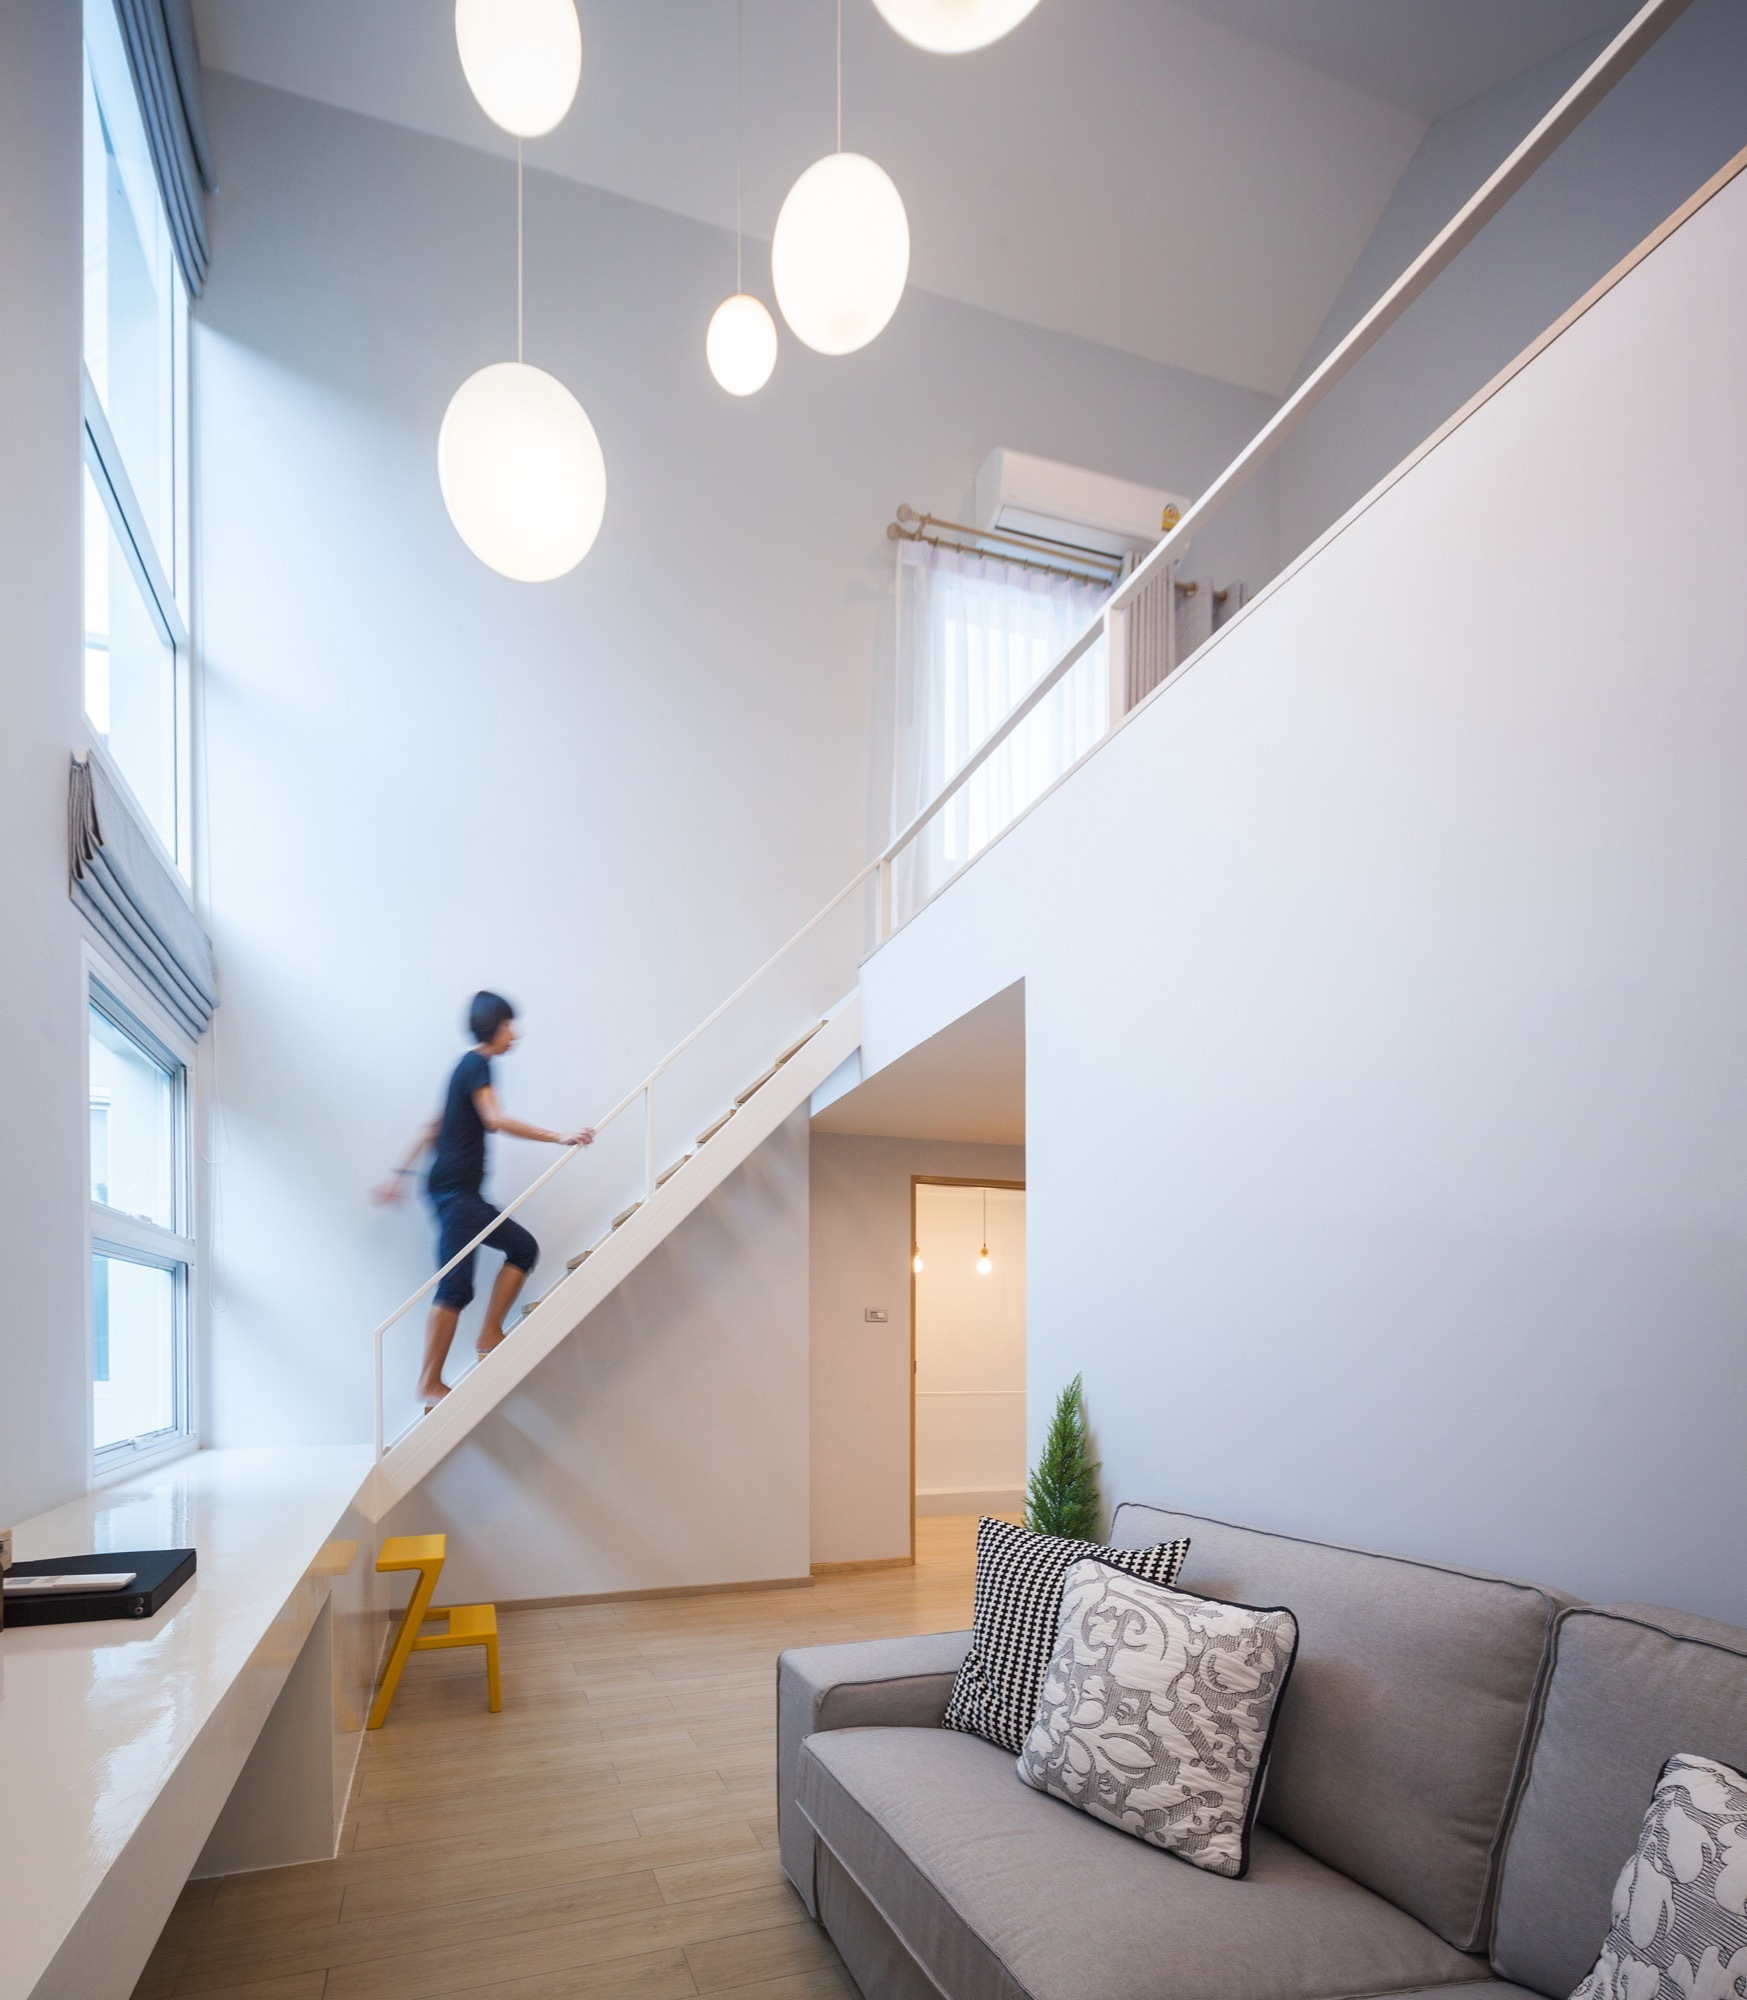 Bridge House By Junsekino Architect And Design: Gallery Of K22 House / Junsekino Architect And Design